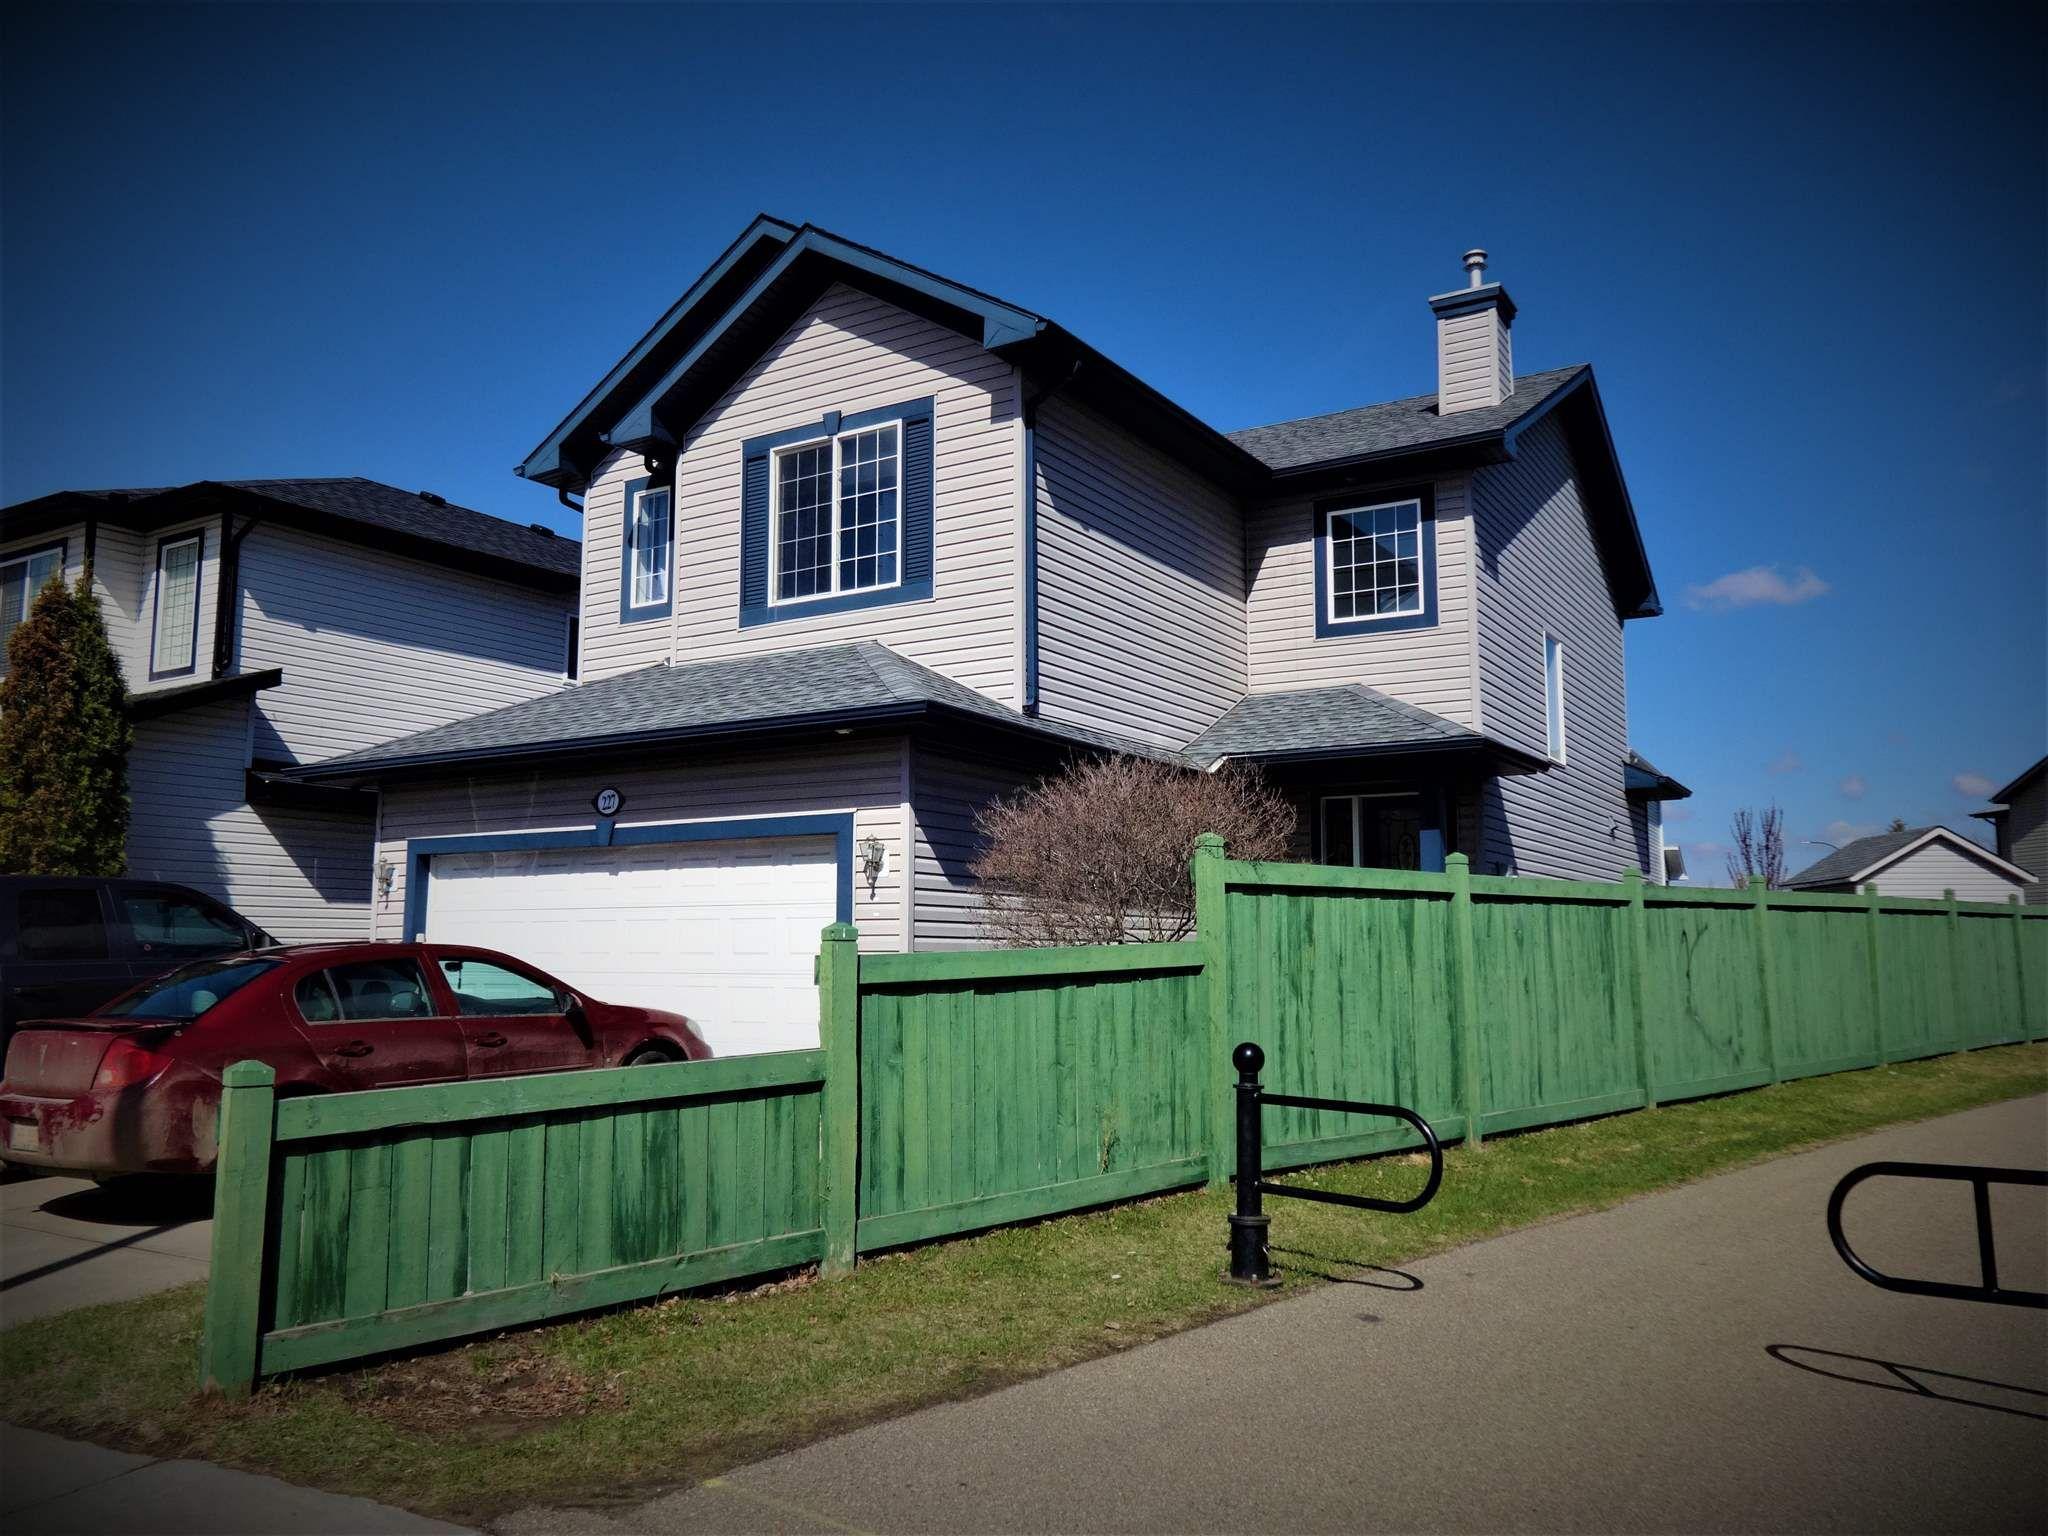 Main Photo: 227 WESTWOOD Point: Fort Saskatchewan House for sale : MLS®# E4254029